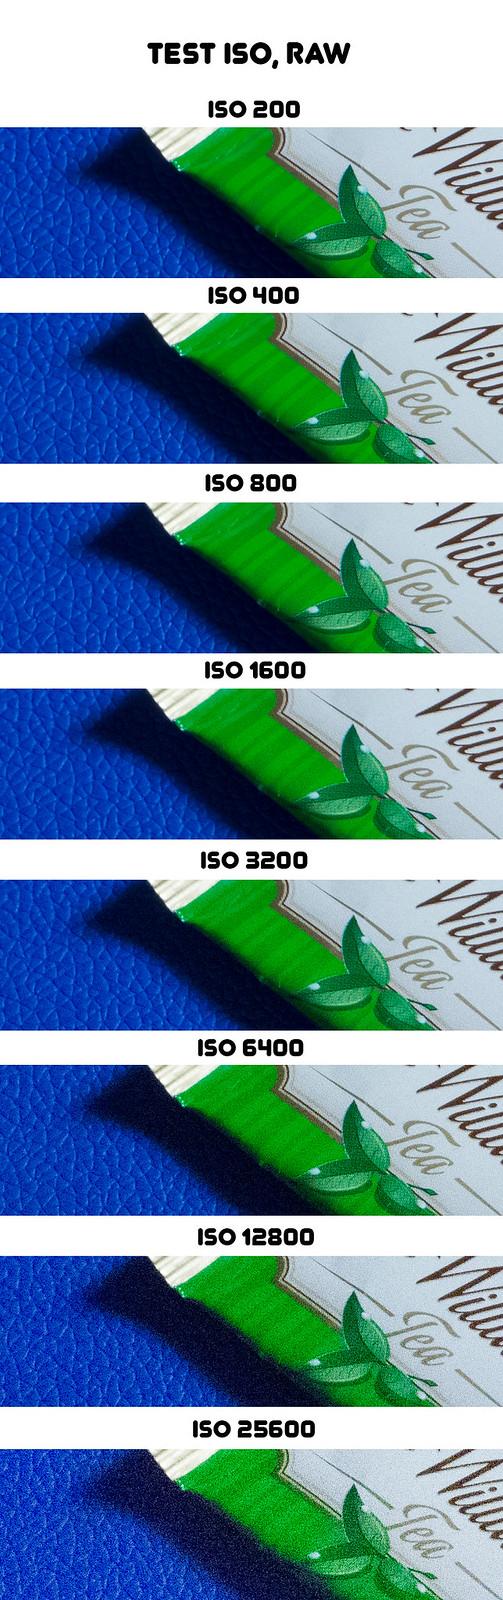 Olympus OM-D E-M10 - test ISO, RAW